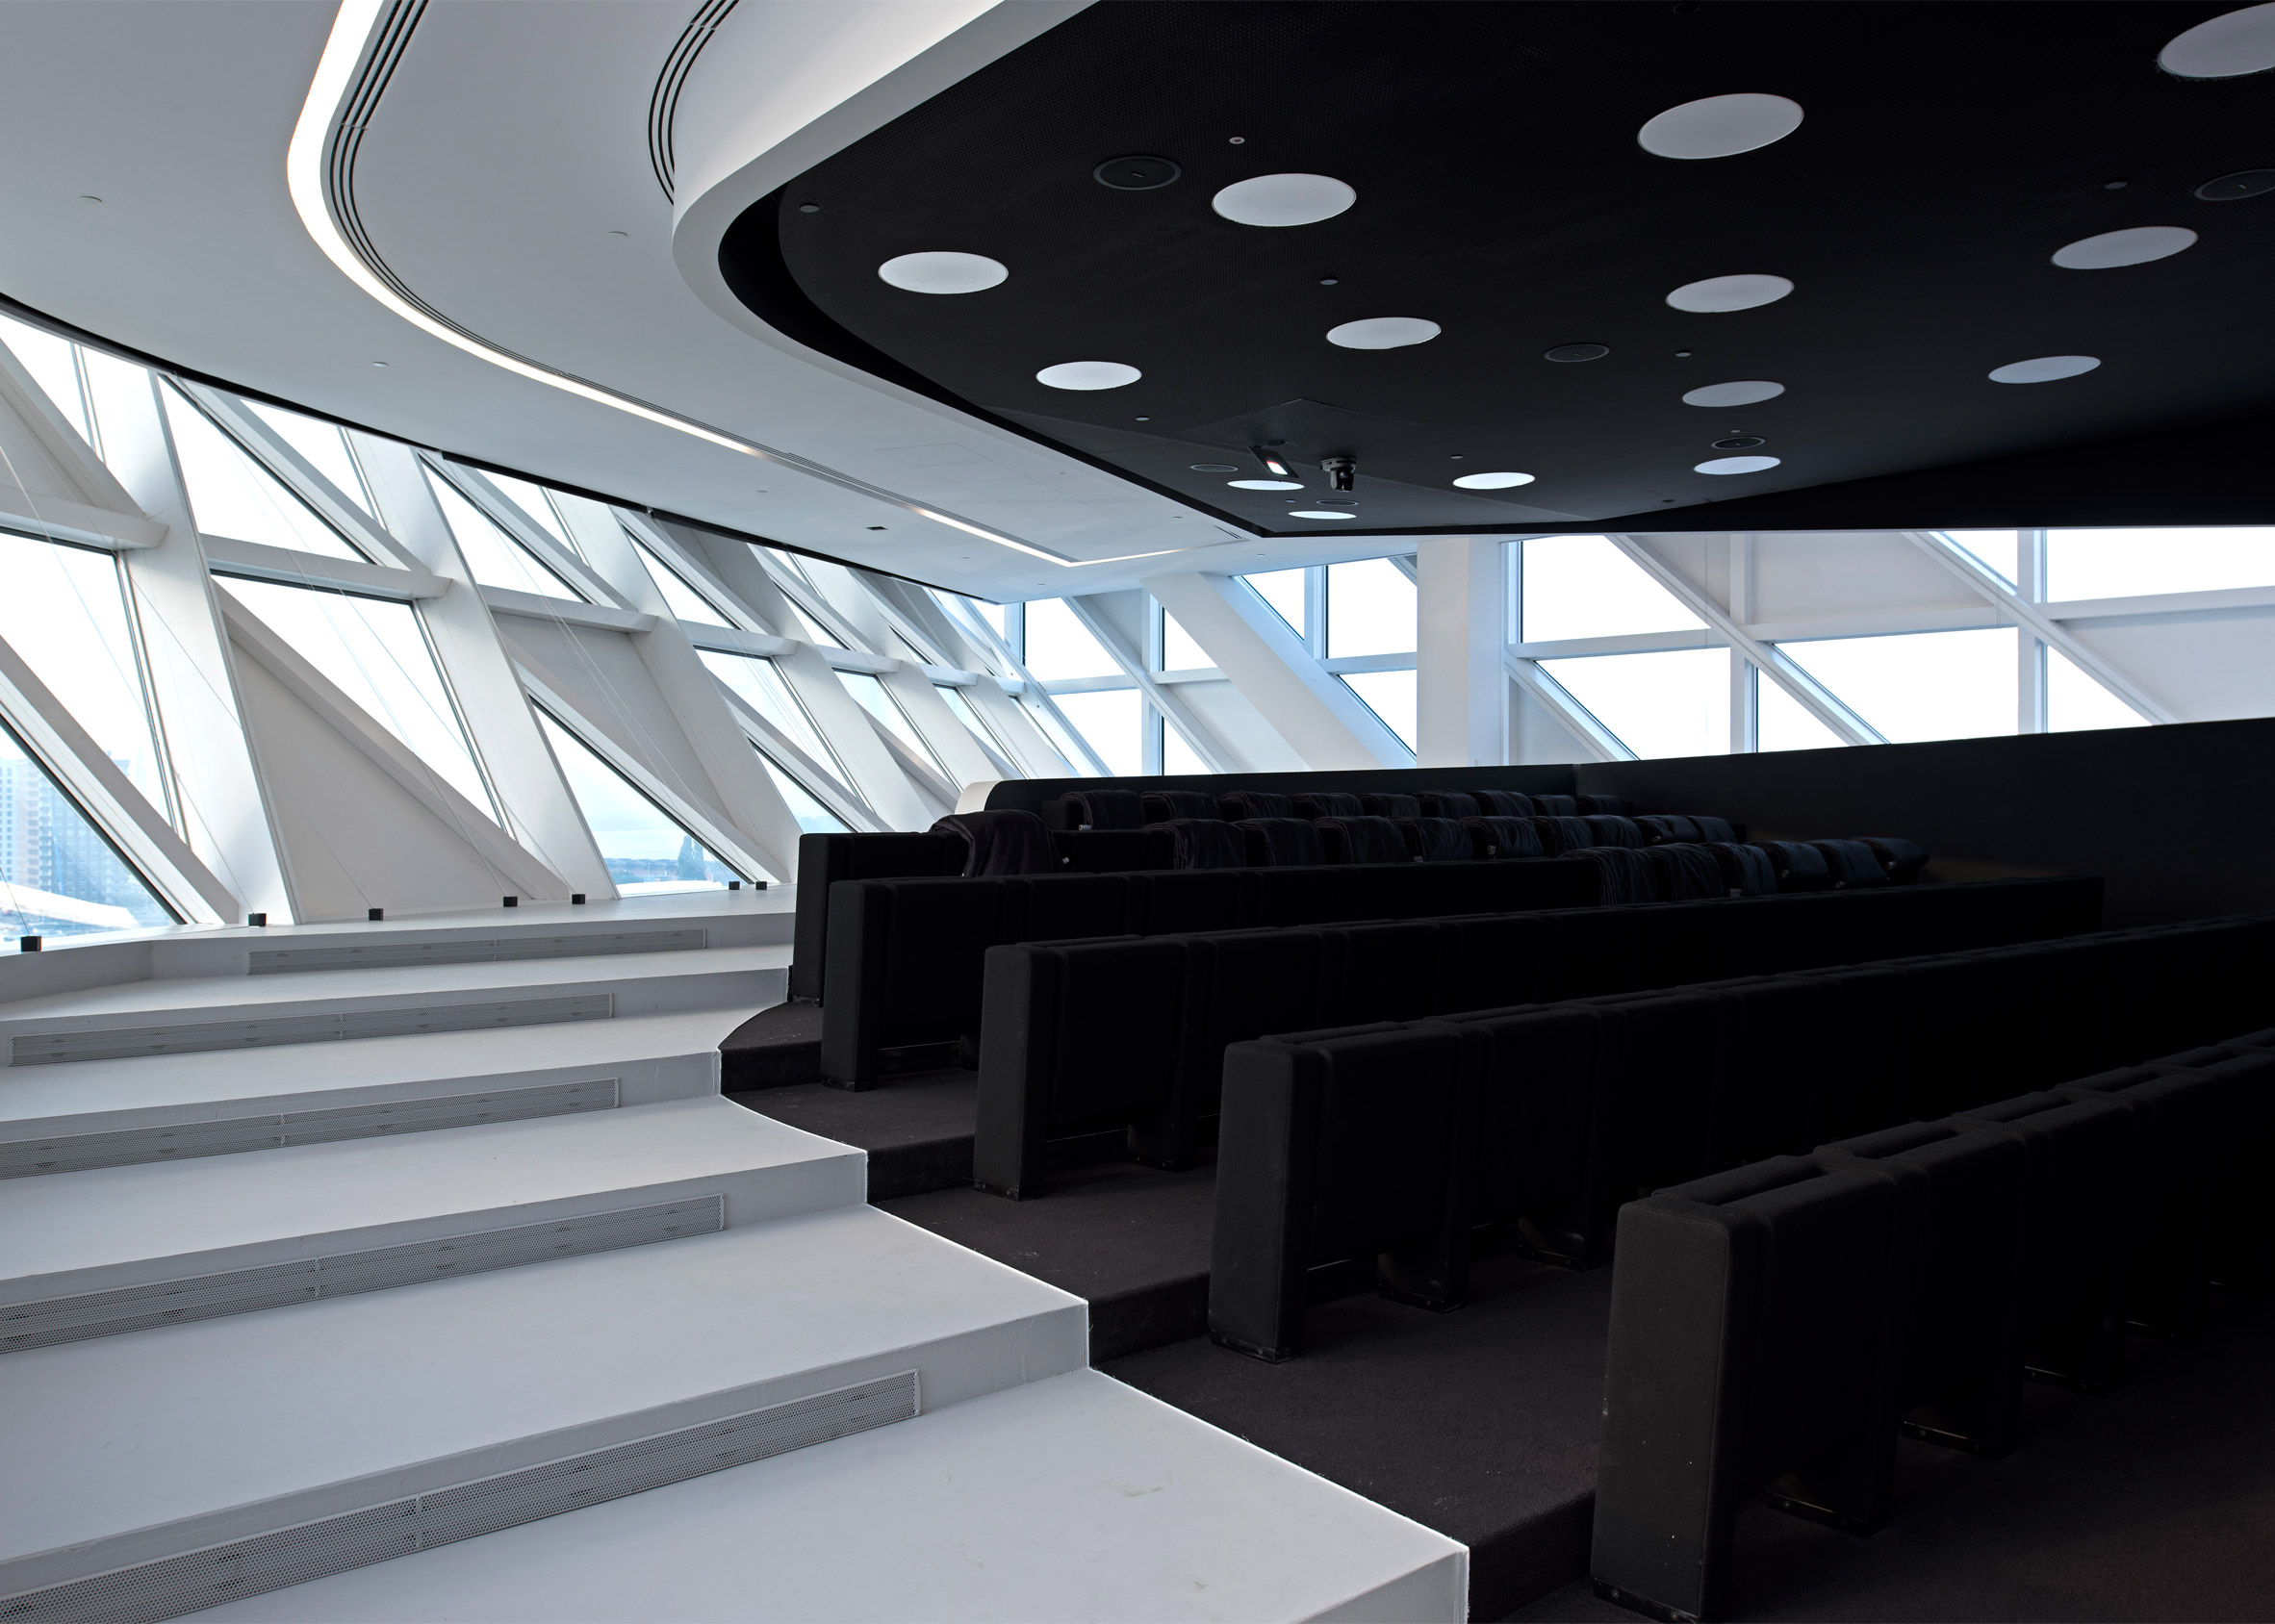 port-house-antwerp-zaha-hadid-architects-tim-fisher_dezeen_2364_ss_1